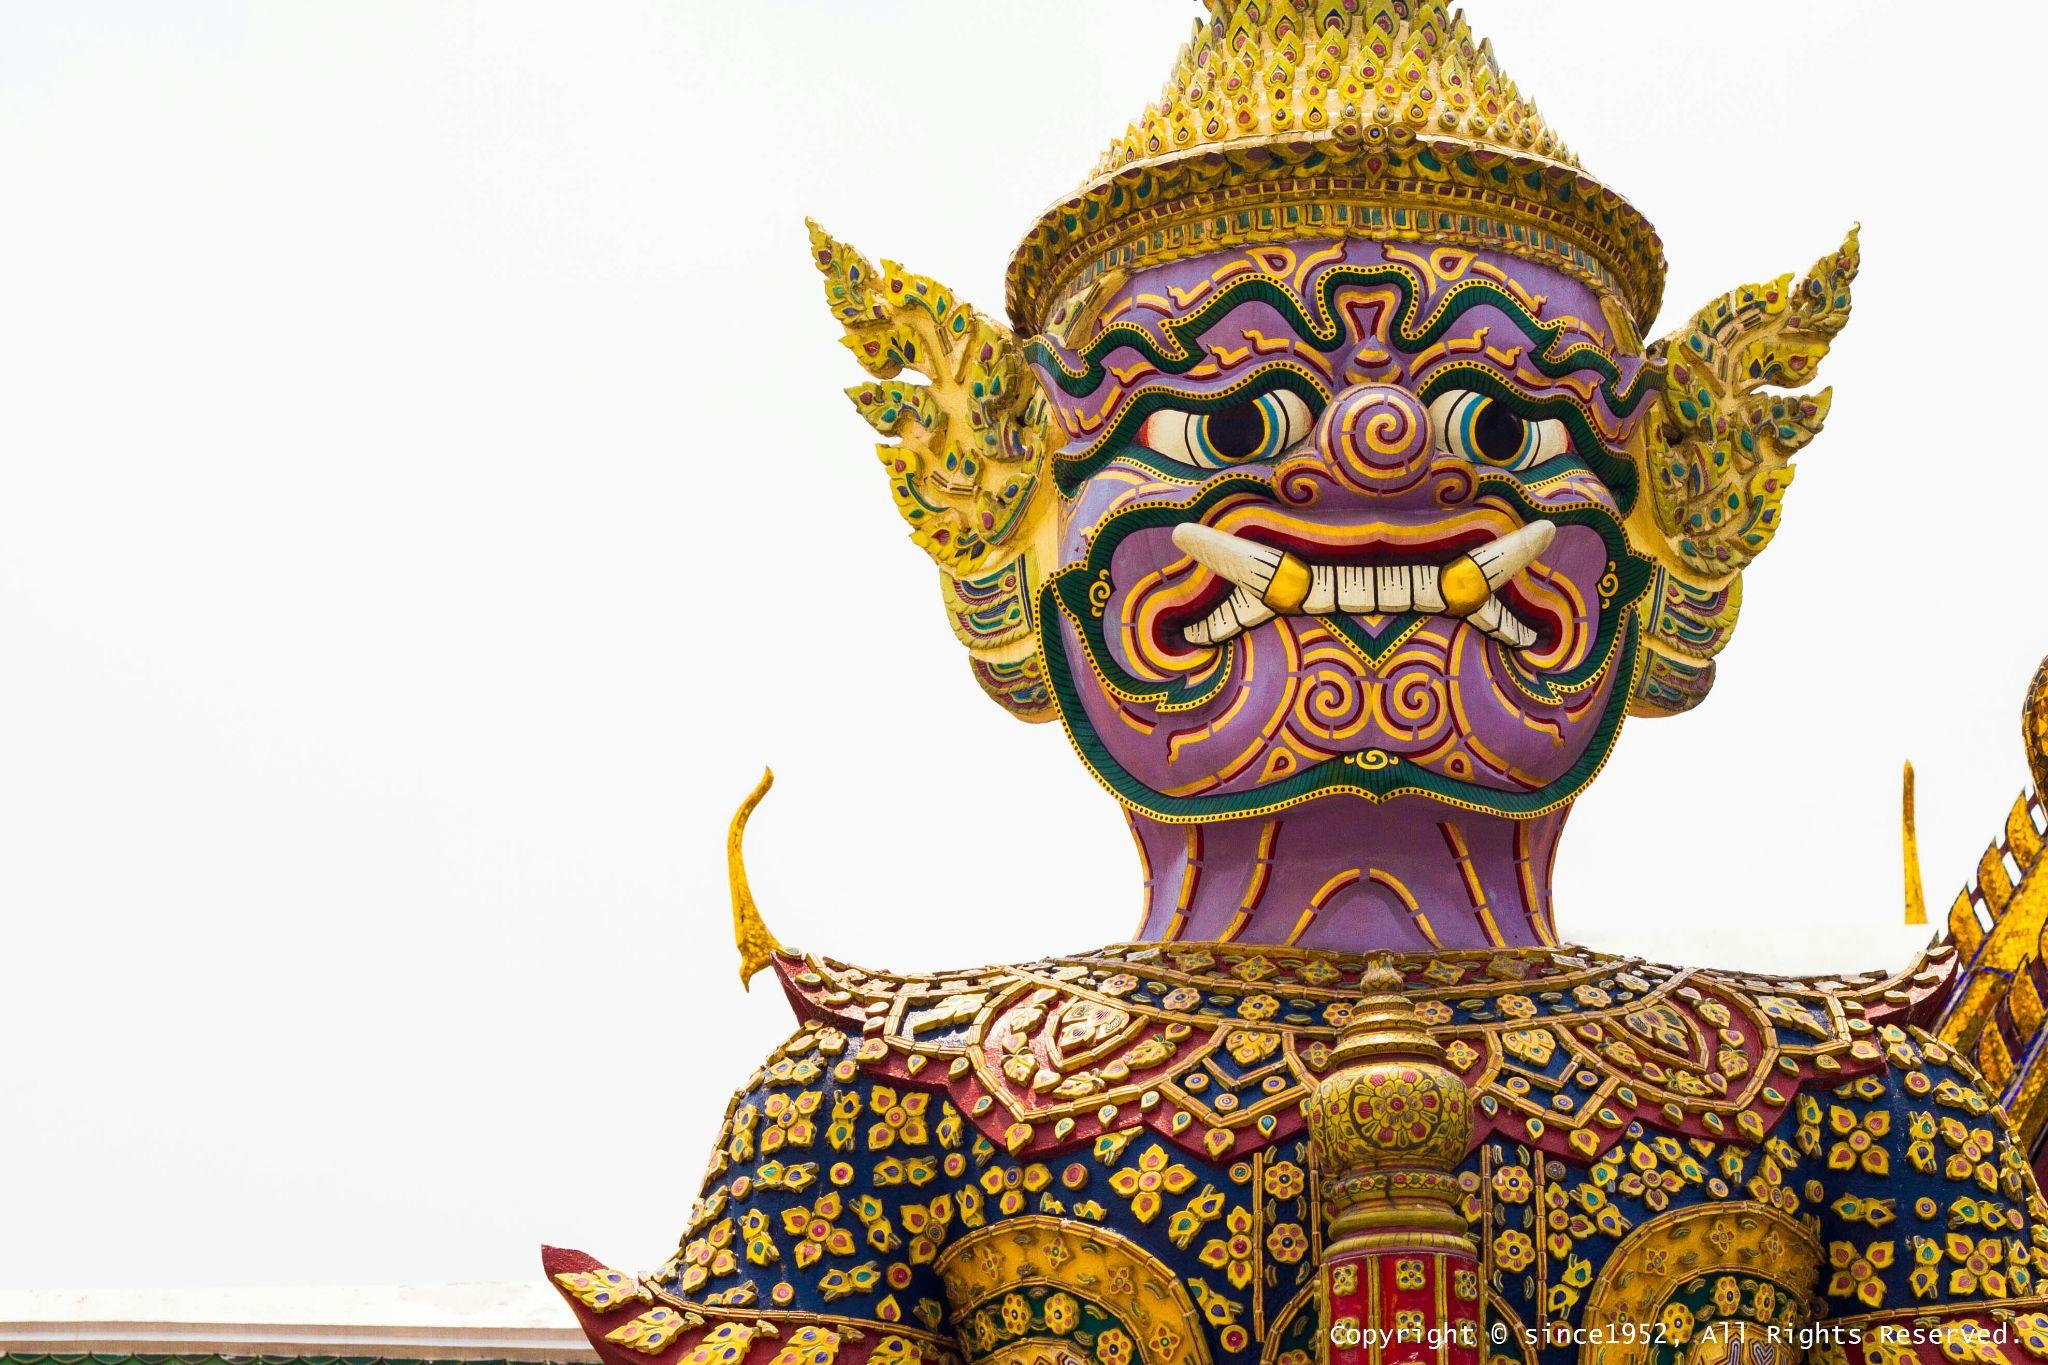 Giant Statues, Wat Phra Kaew  by addynicephotographer